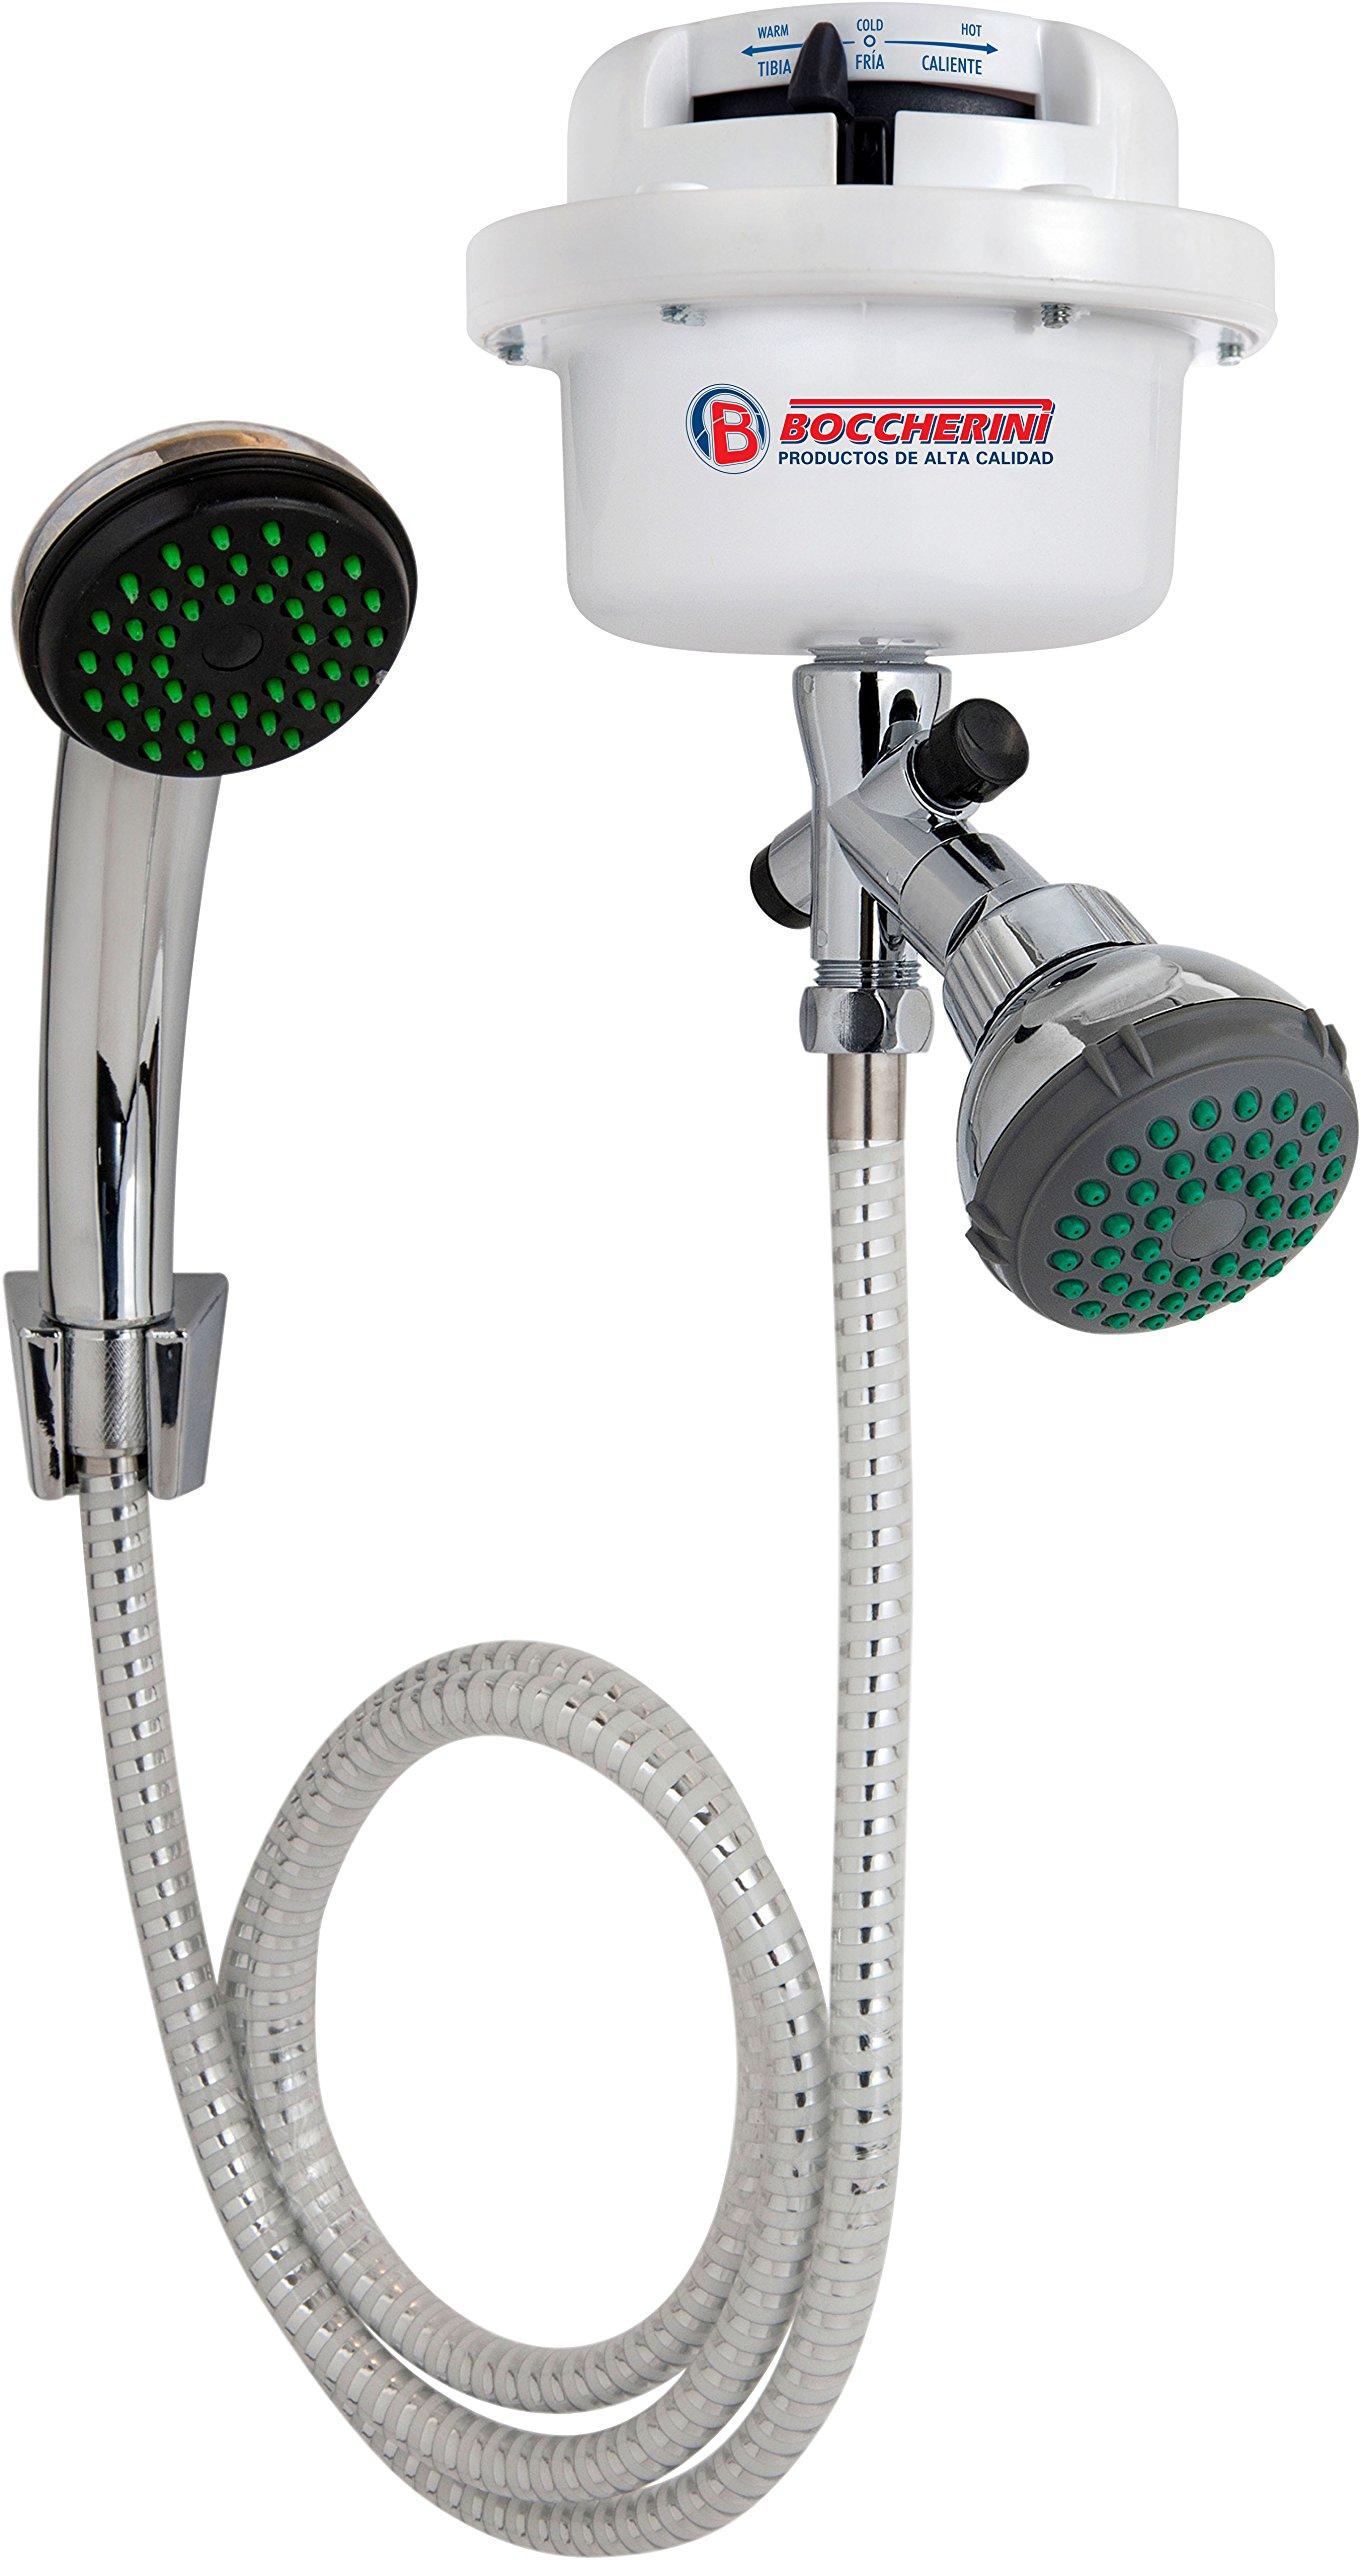 GARLAT Boccherini Electric Flexible Stainless